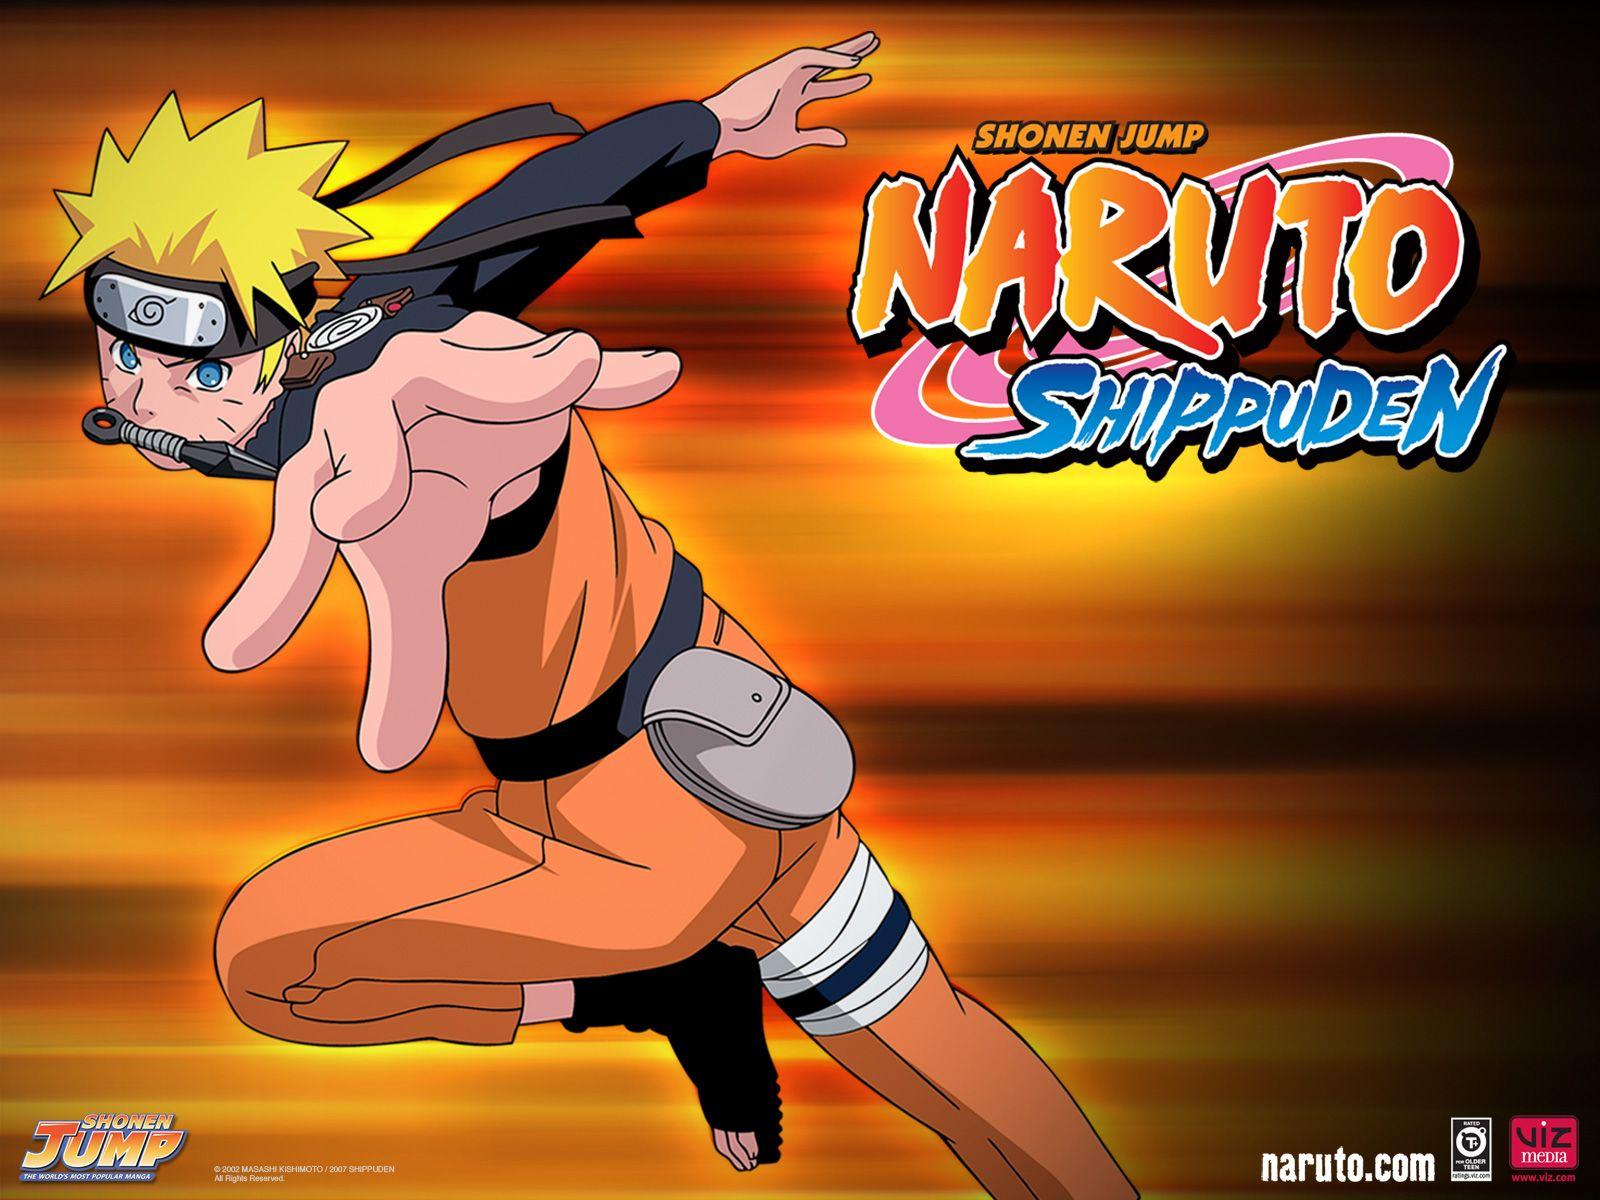 Naruto Shippuden Naruto shippuden, Naruto episodes